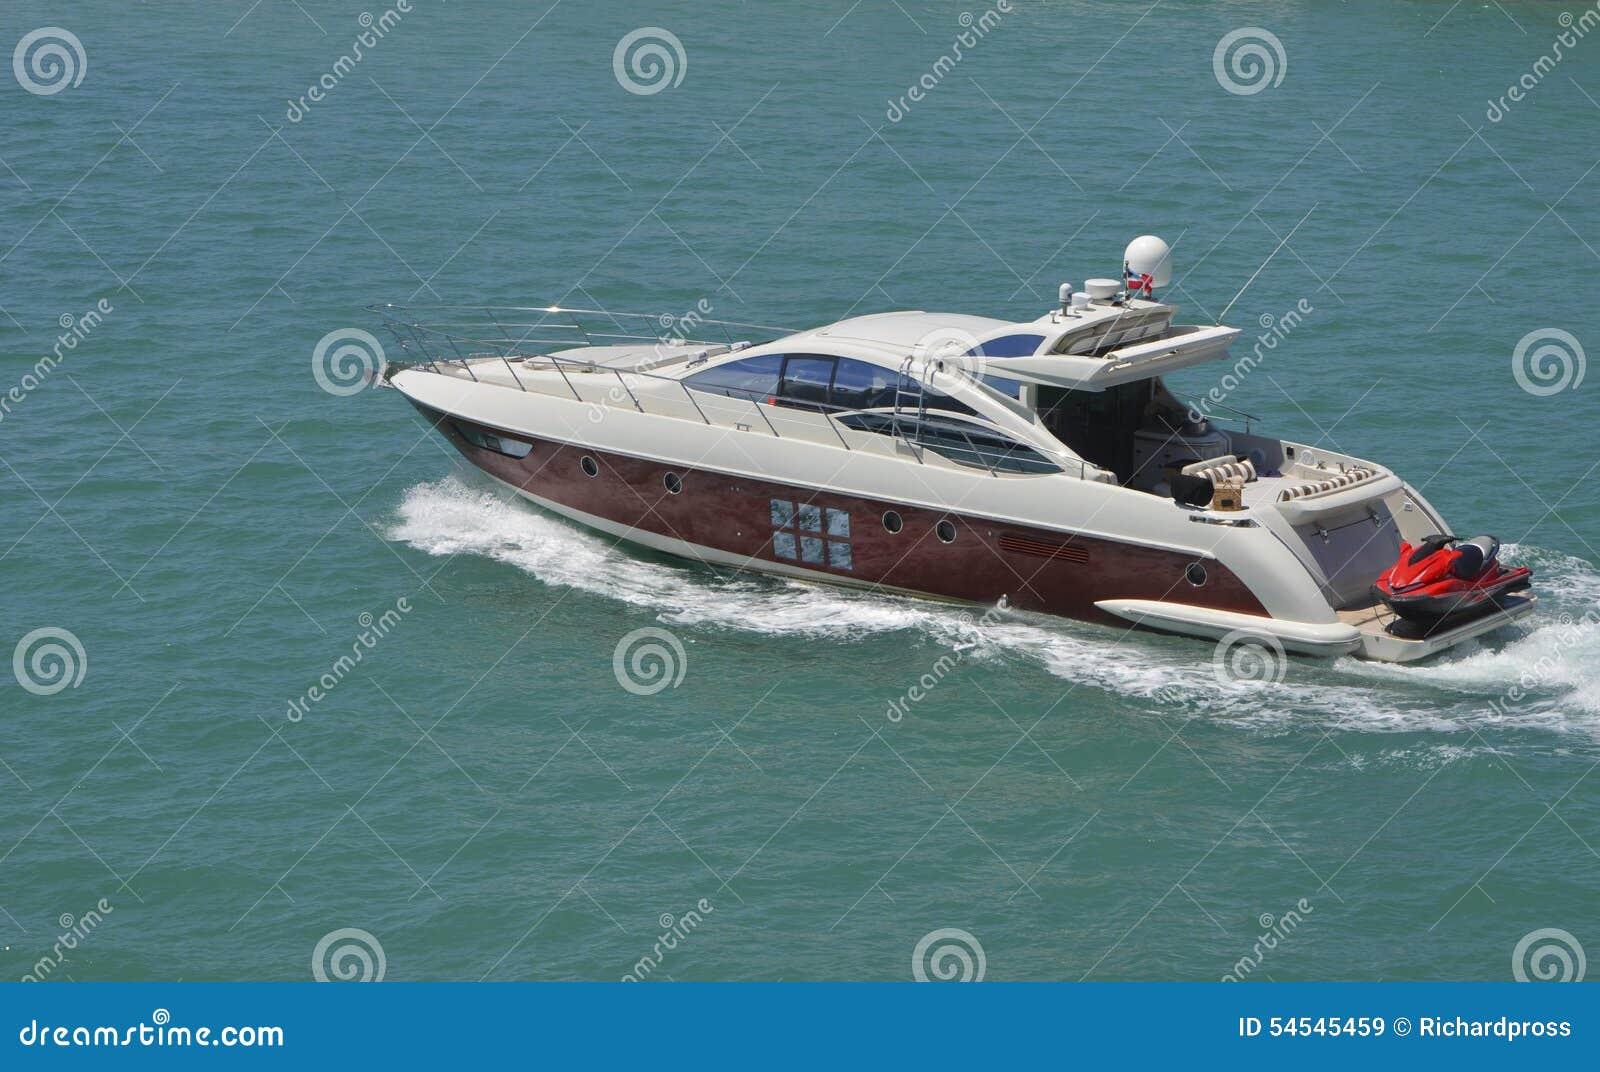 Luxurious Cabin Cruiser Stock Photo Image 54545459